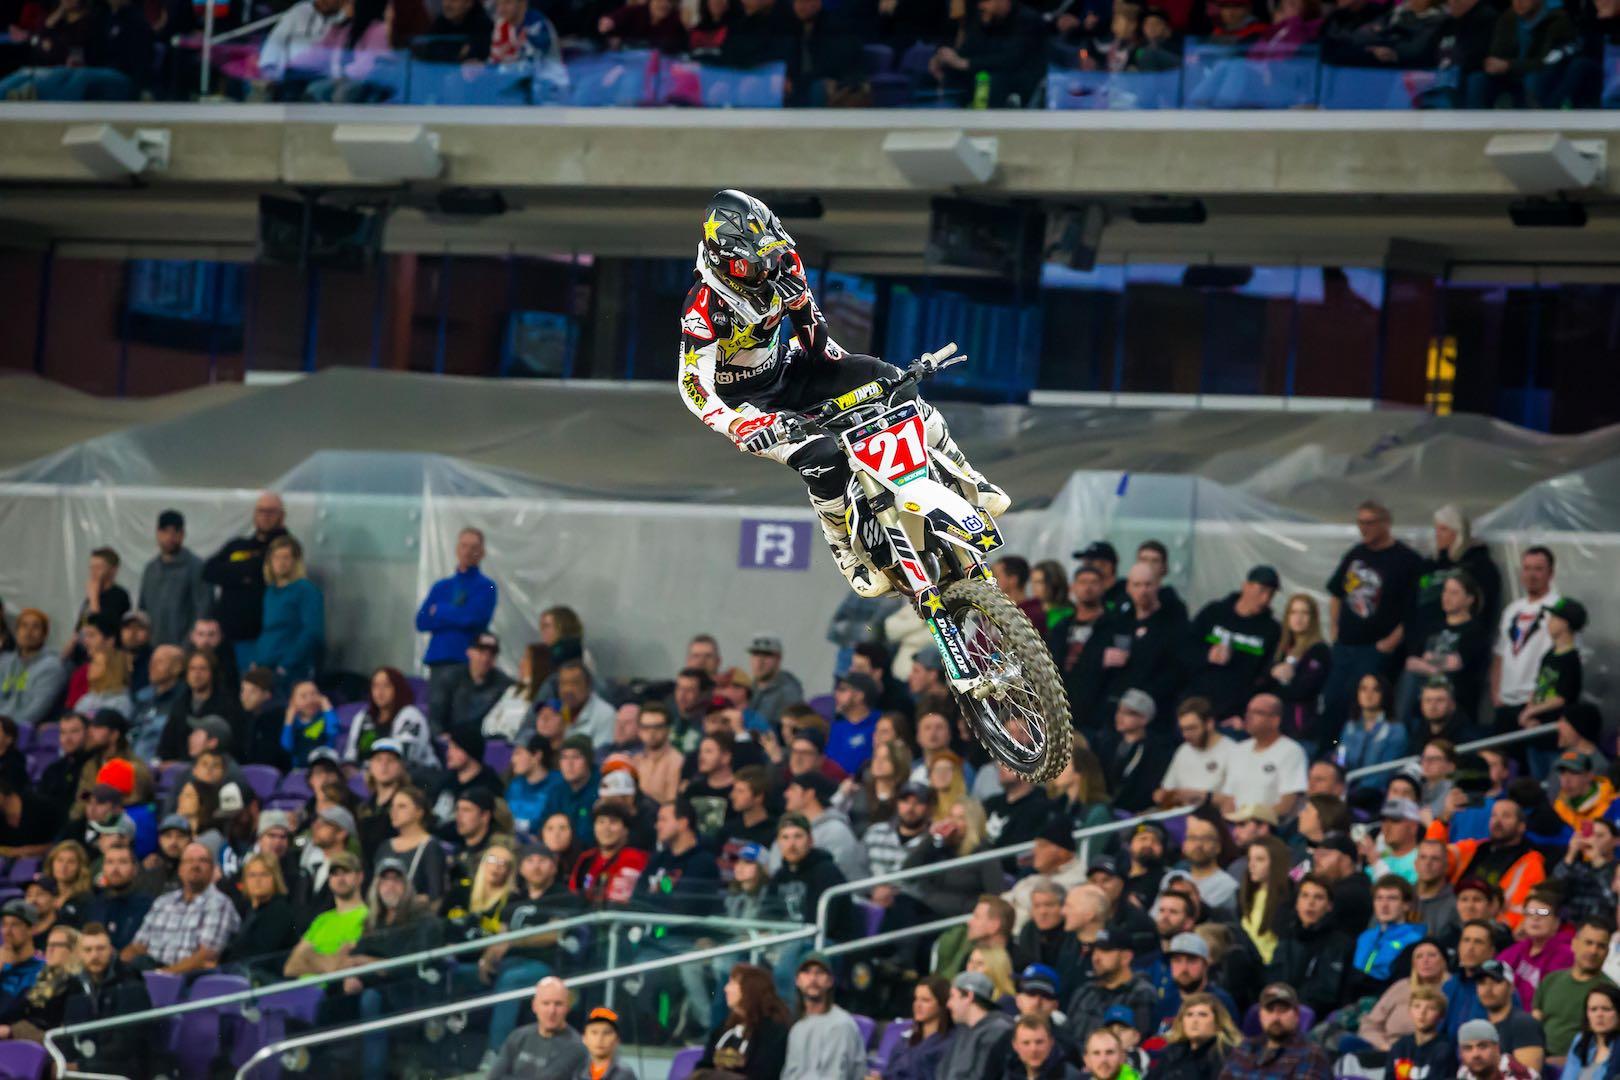 2018 Salt Lake City Supercross Preview  Husky Jason Anderson